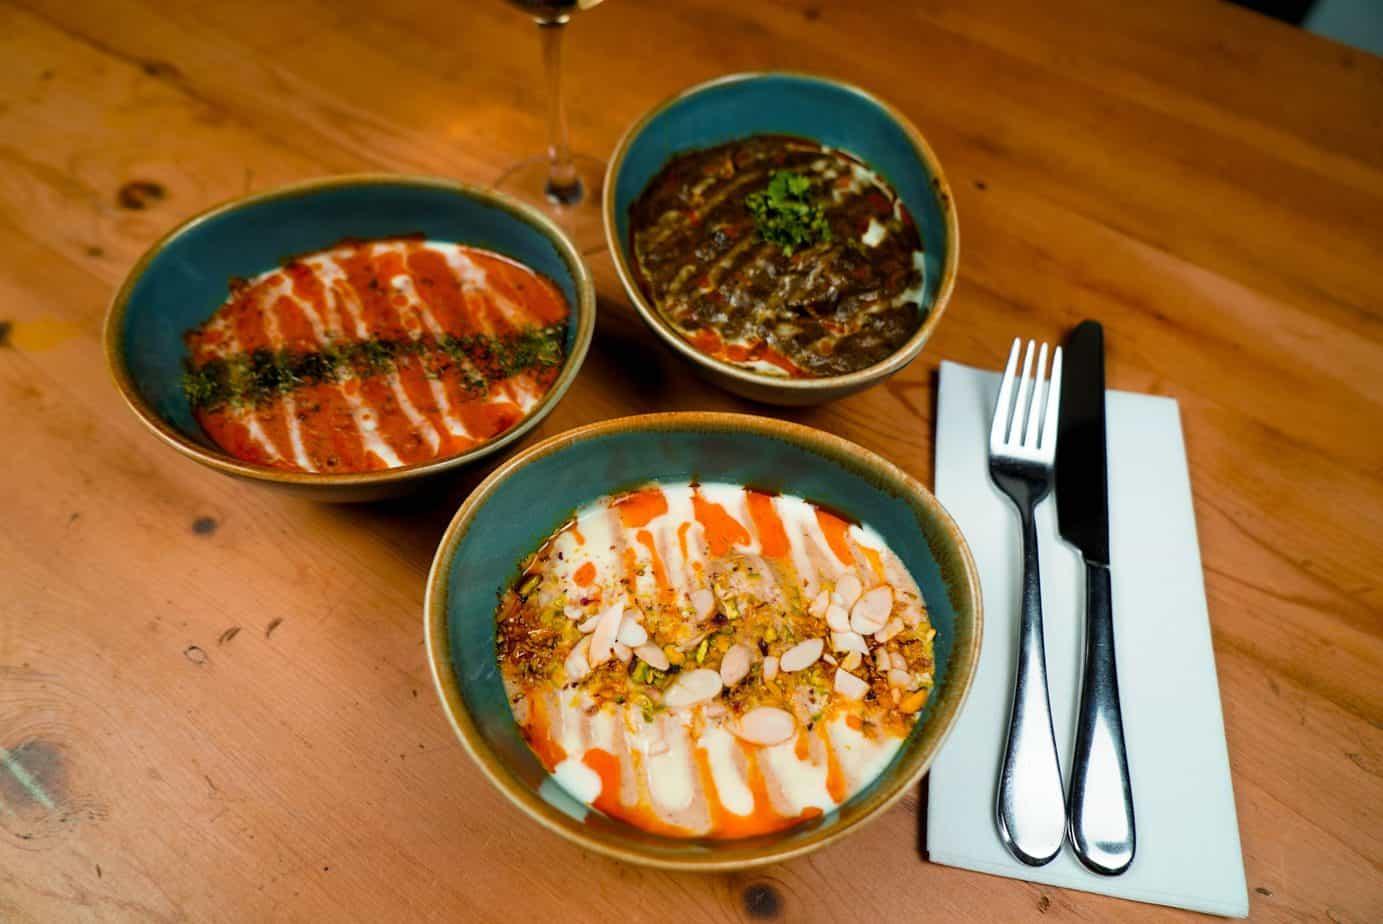 Malai Kofta, Dahl Makhani, Saag Paneer - un repas végétarien